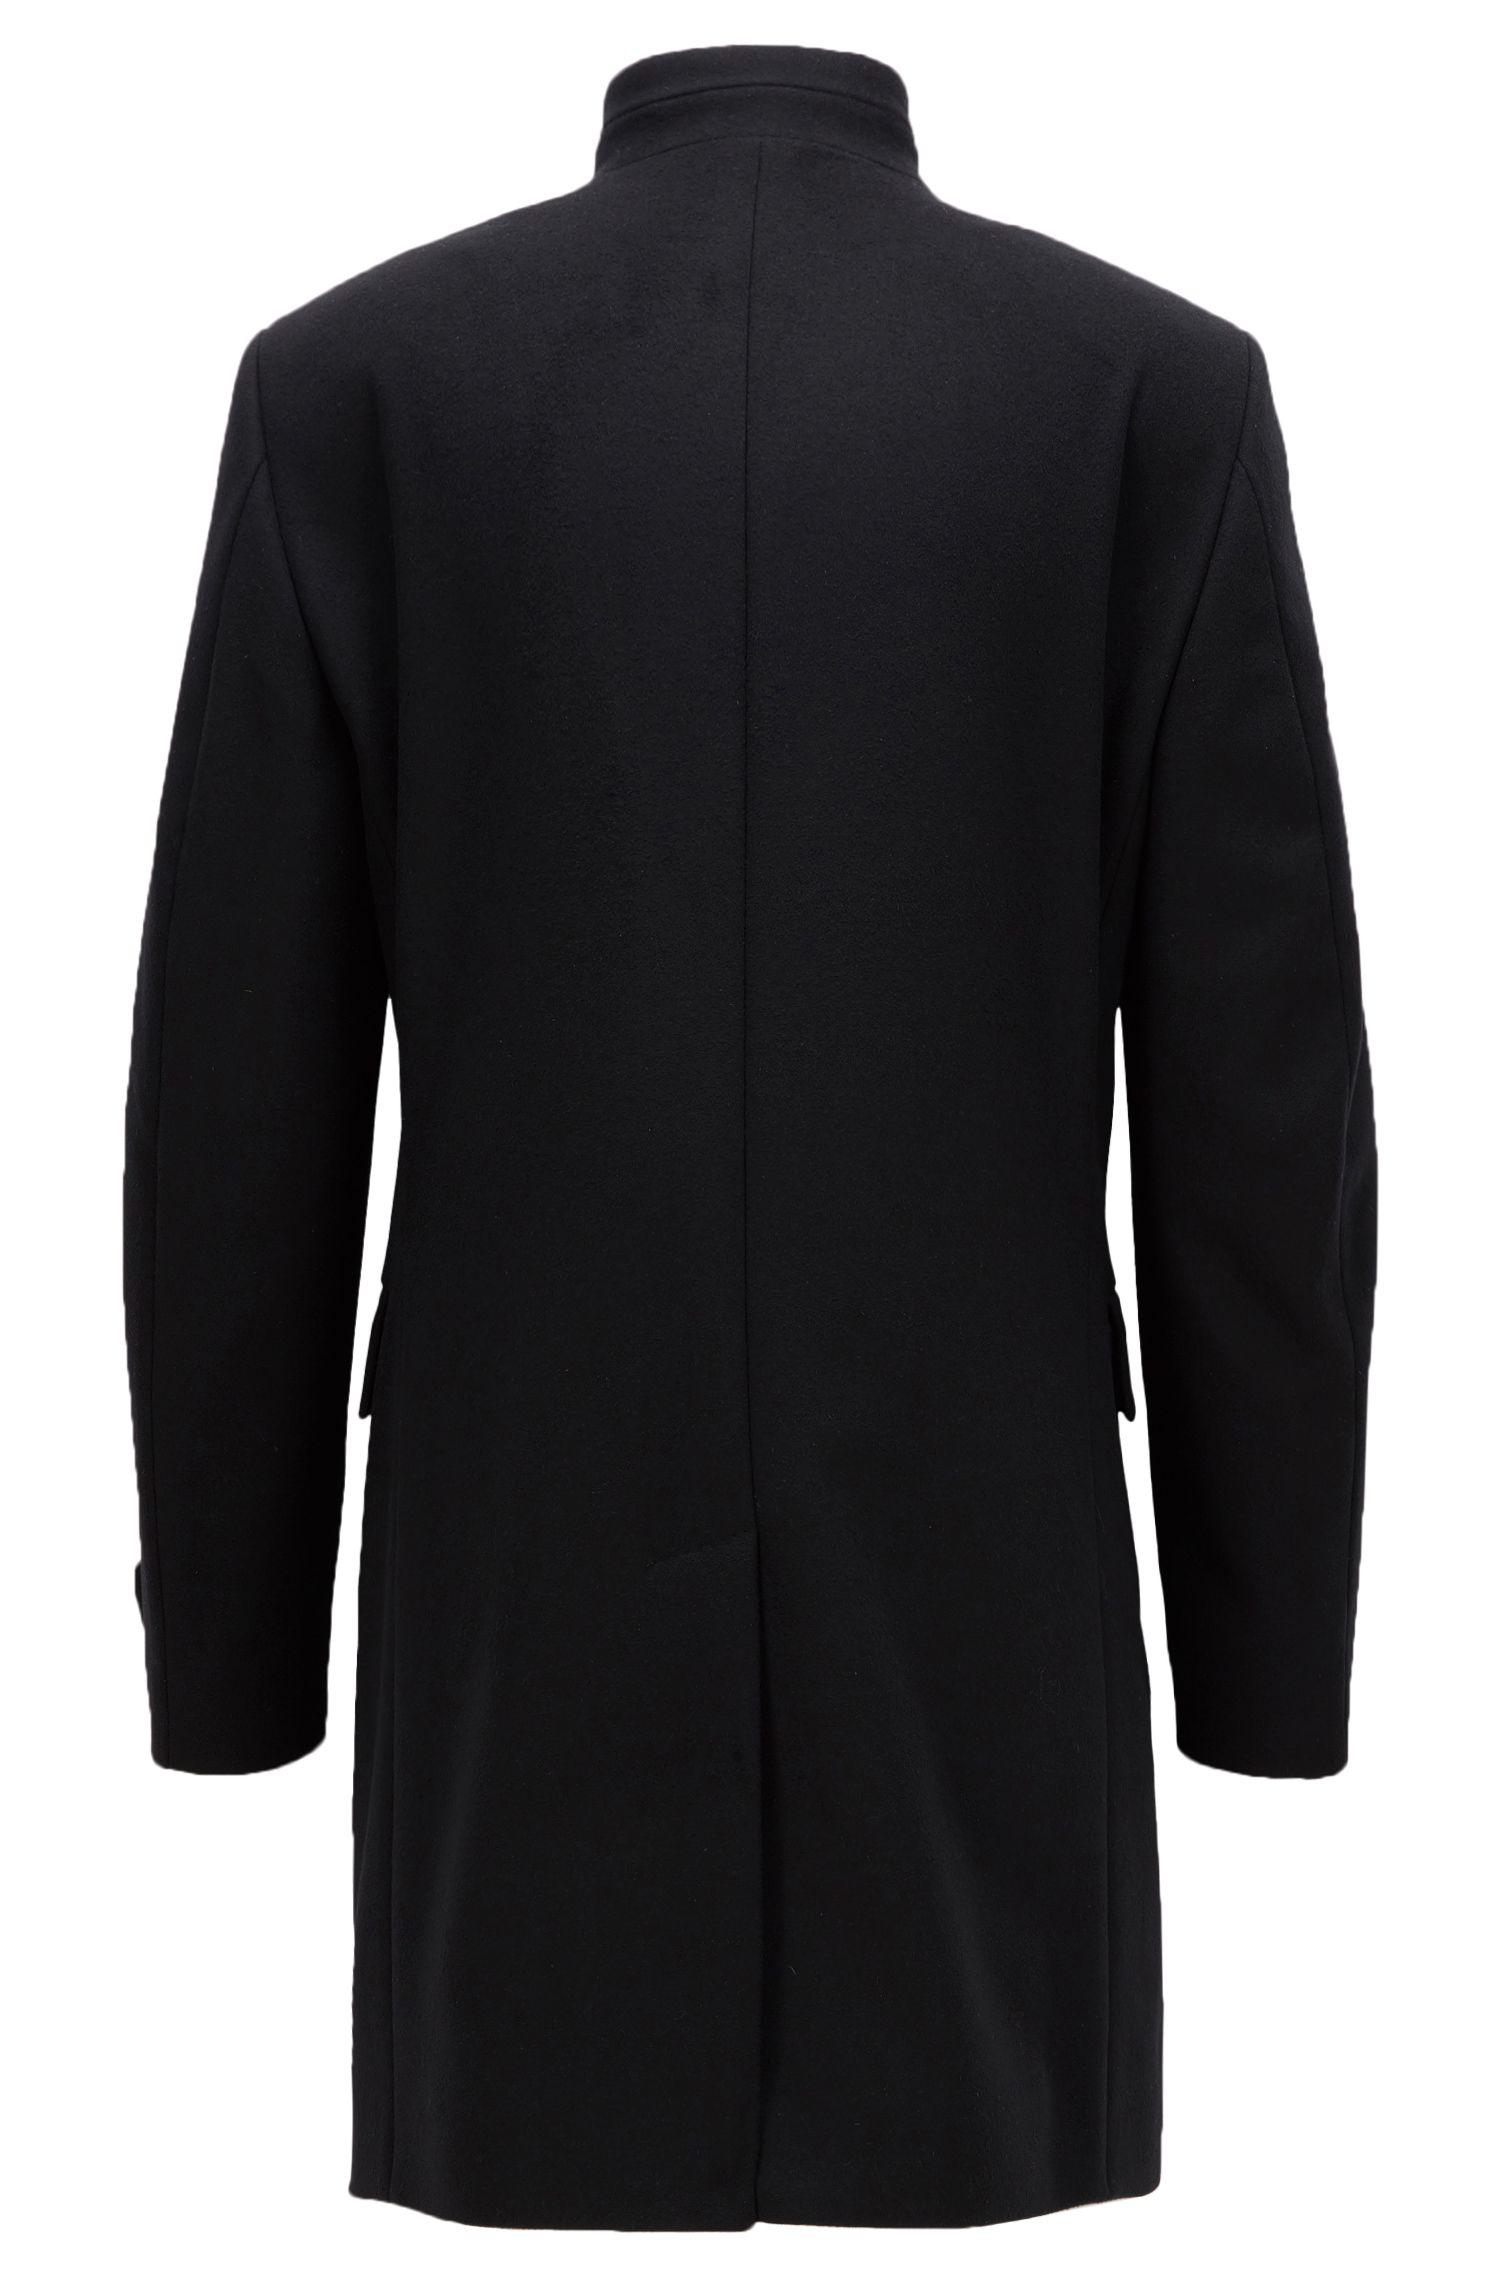 Virgin Wool Cashmere Coat | Sintrax, Black